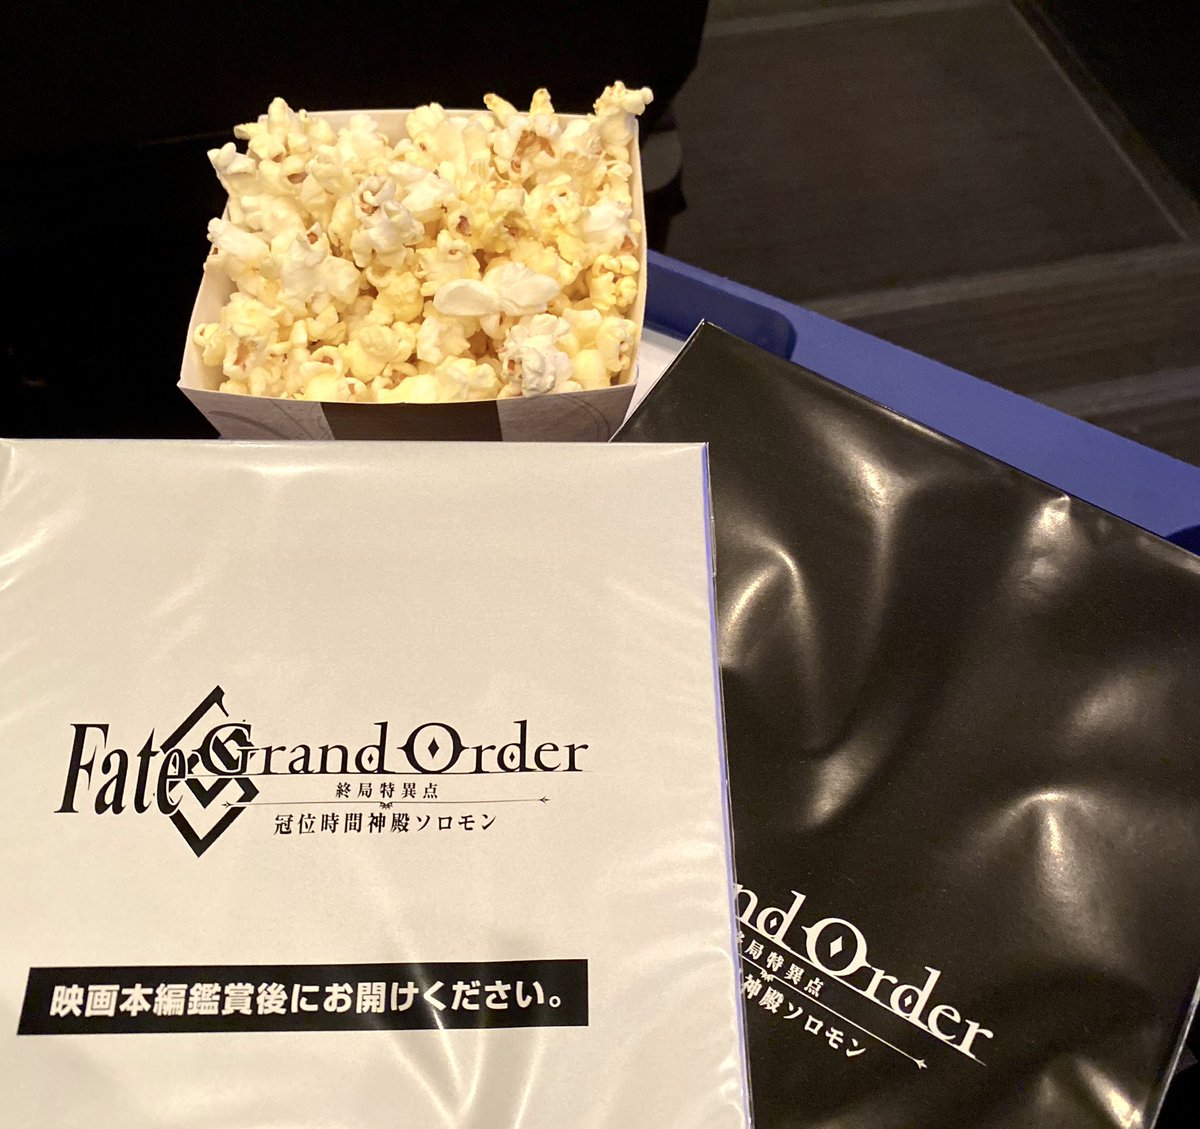 test ツイッターメディア - 『Fate/Grand Order ‐終局特異点 冠位時間神殿ソロモン‐』観に来たマン! https://t.co/Rls6X0T2ib